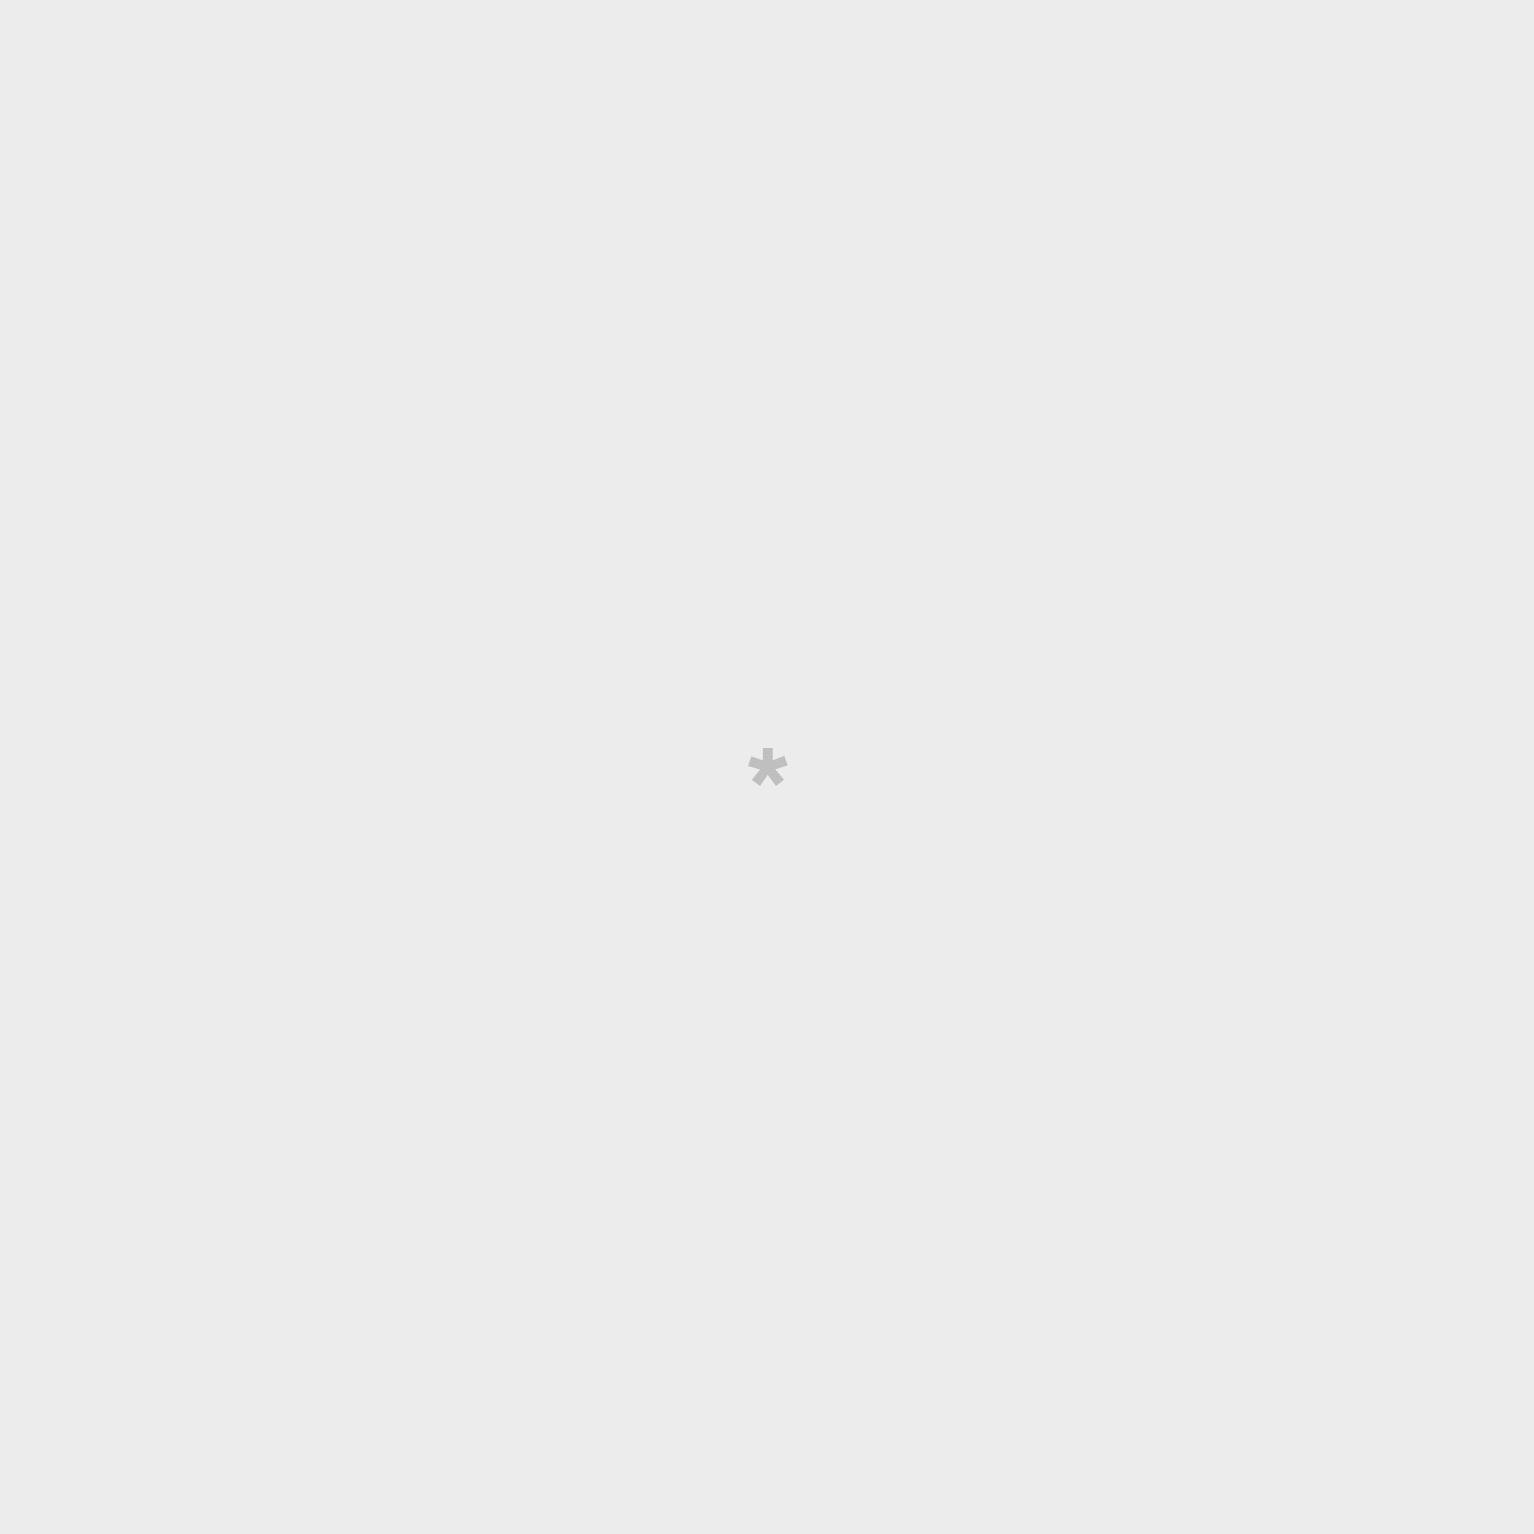 Friendship gift kit - Adventures, memories and selfies